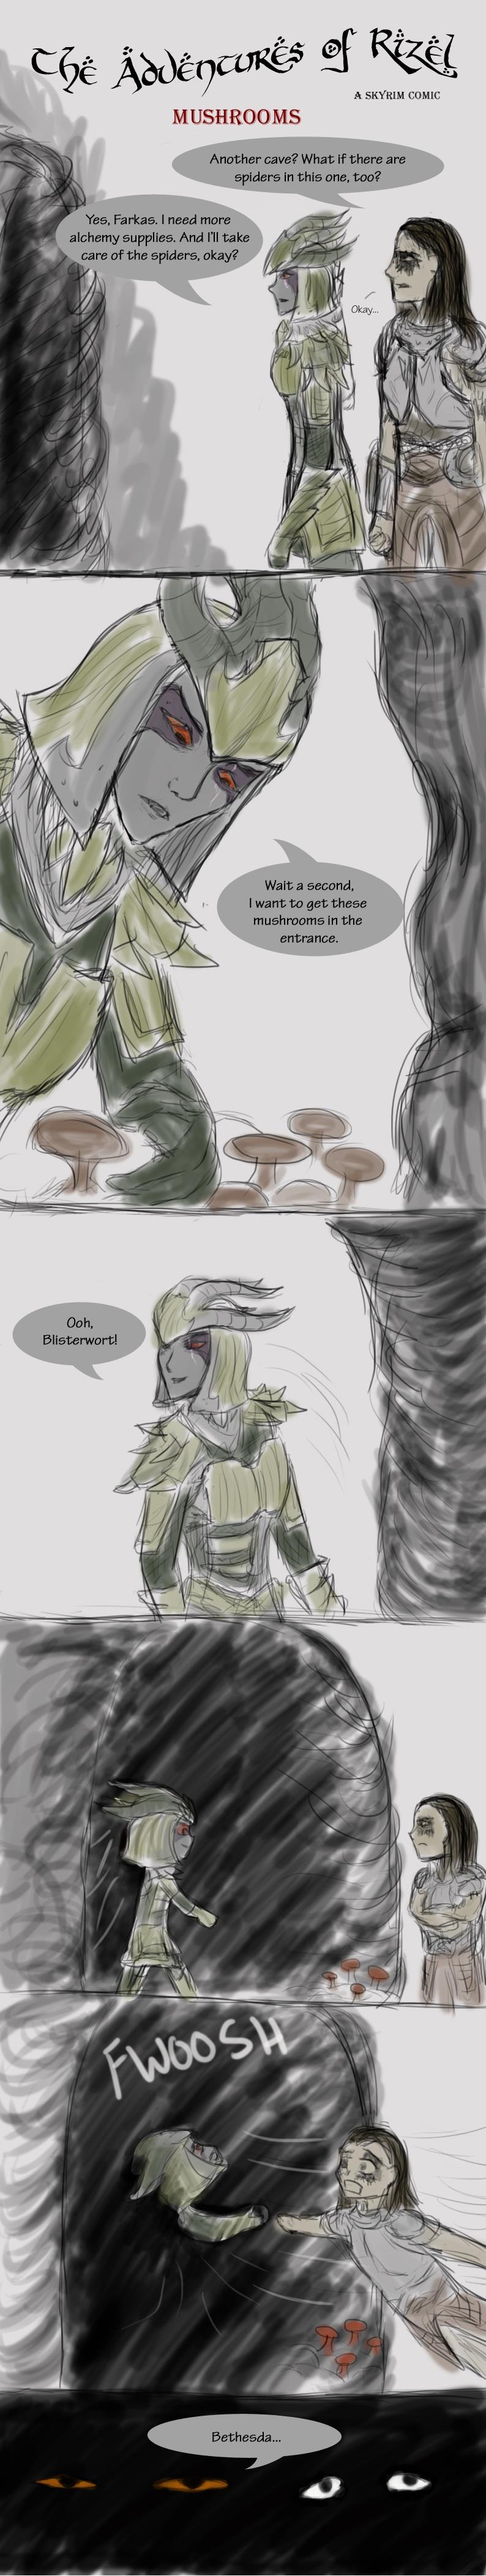 The Adventures of Rizel: Mushrooms by Nighthawk42